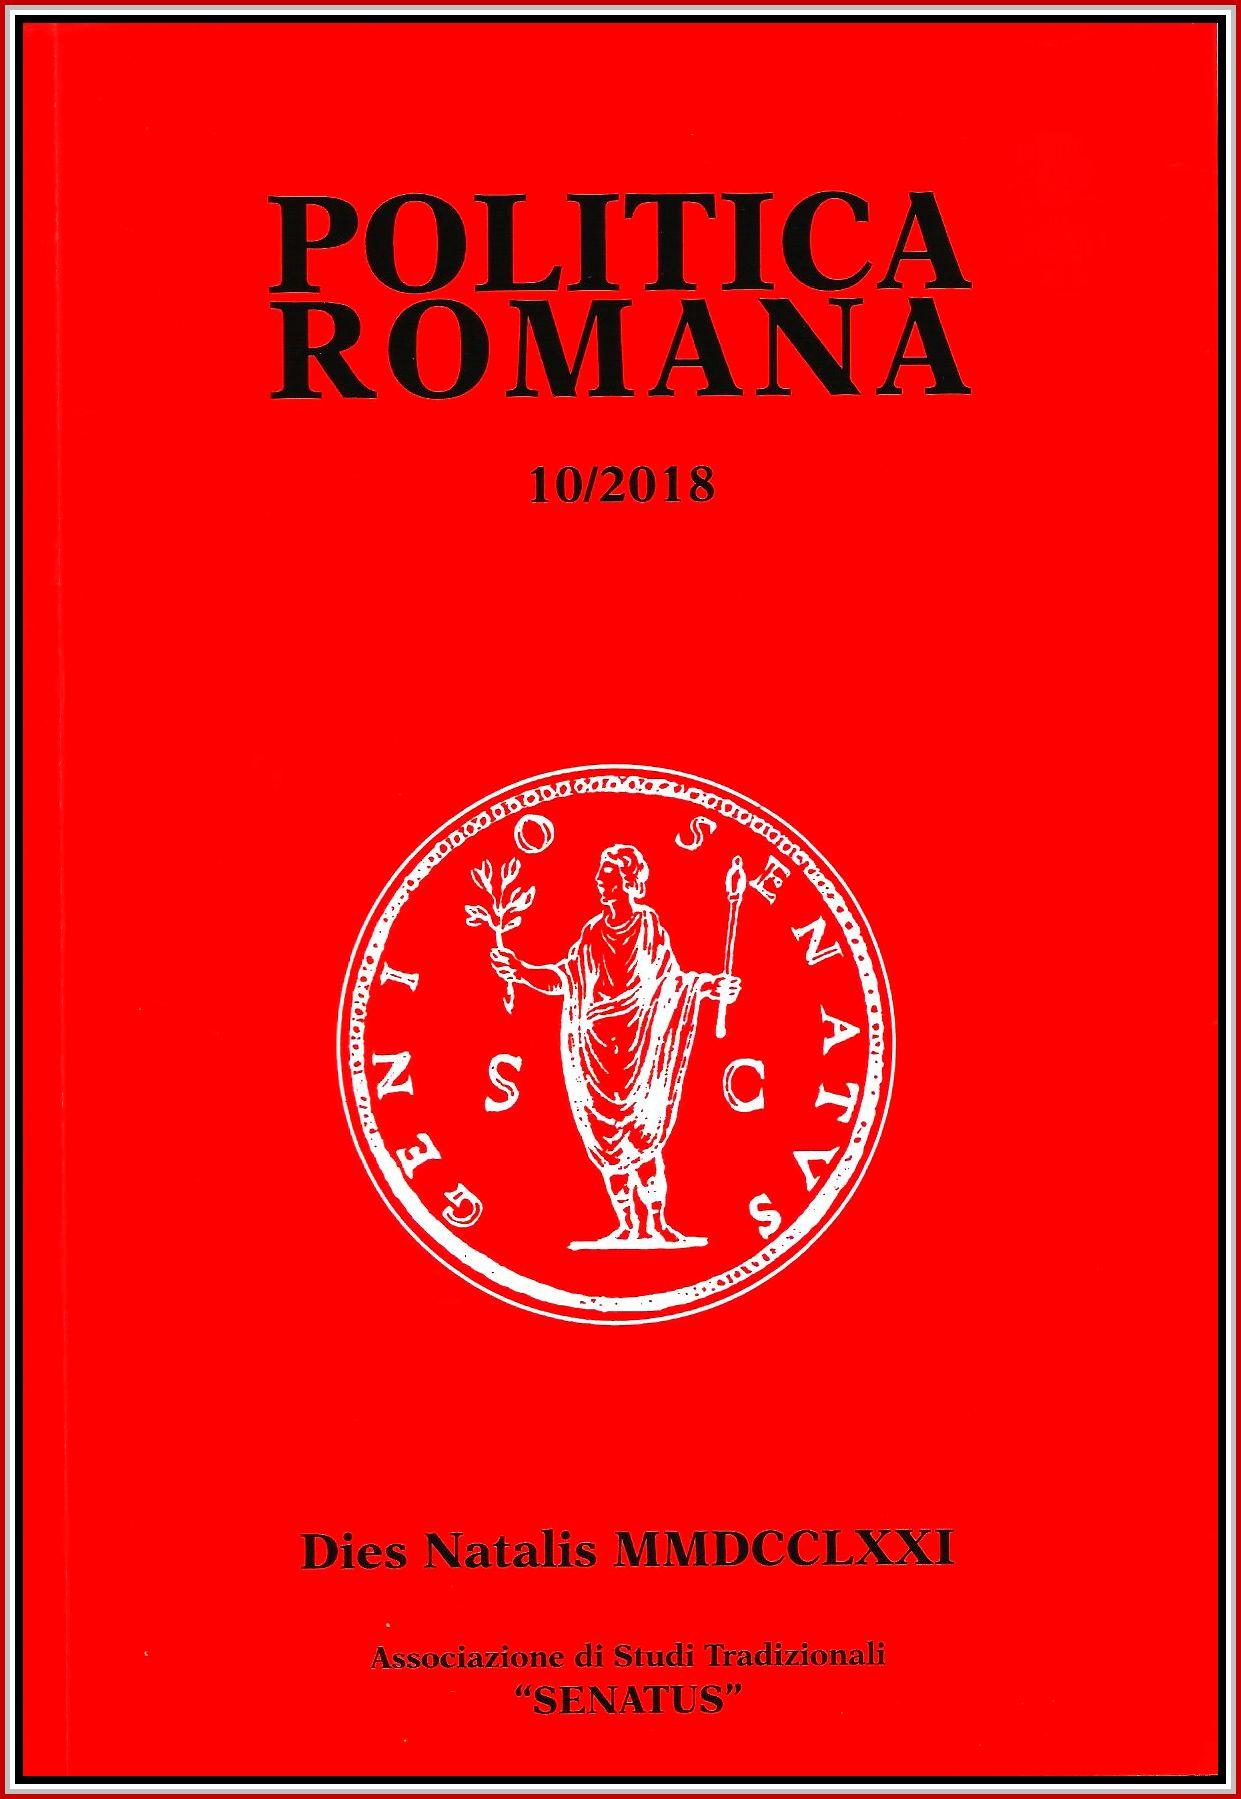 Politica Romana n. 10